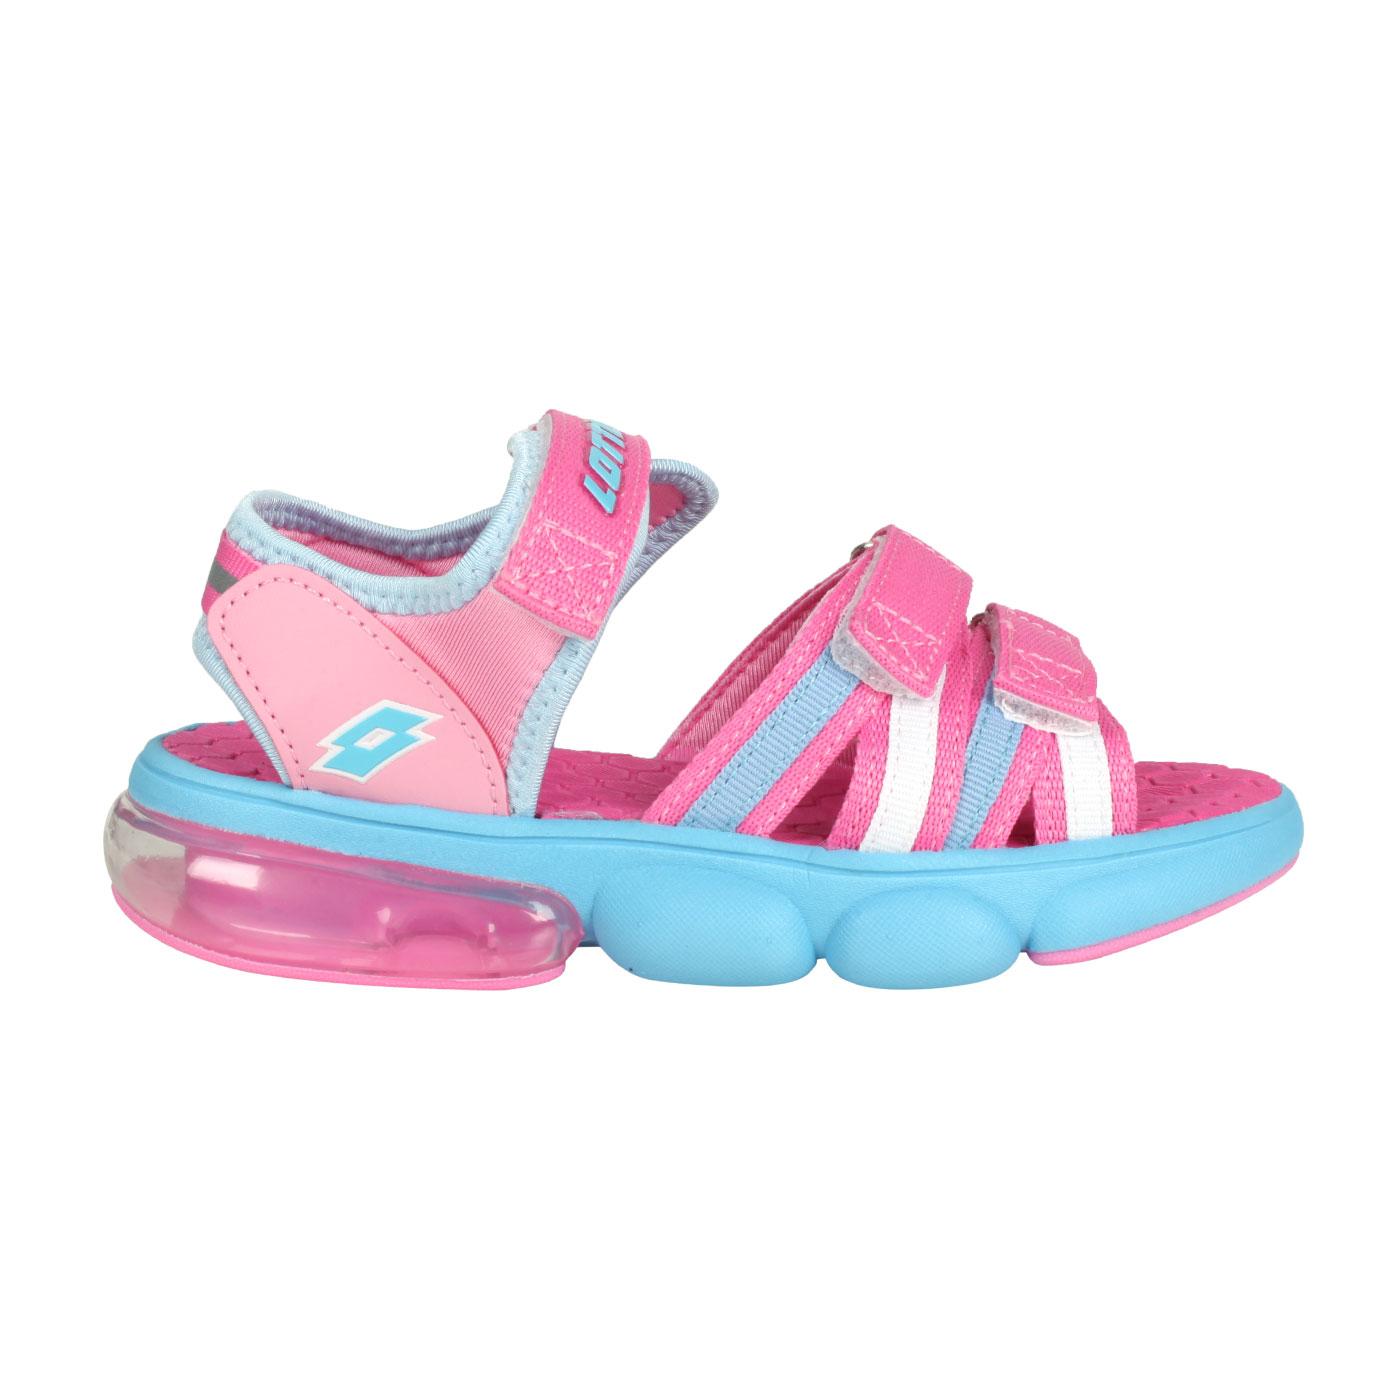 LOTTO 大童織帶氣墊涼鞋 LT1AKS3203 - 桃紅水藍